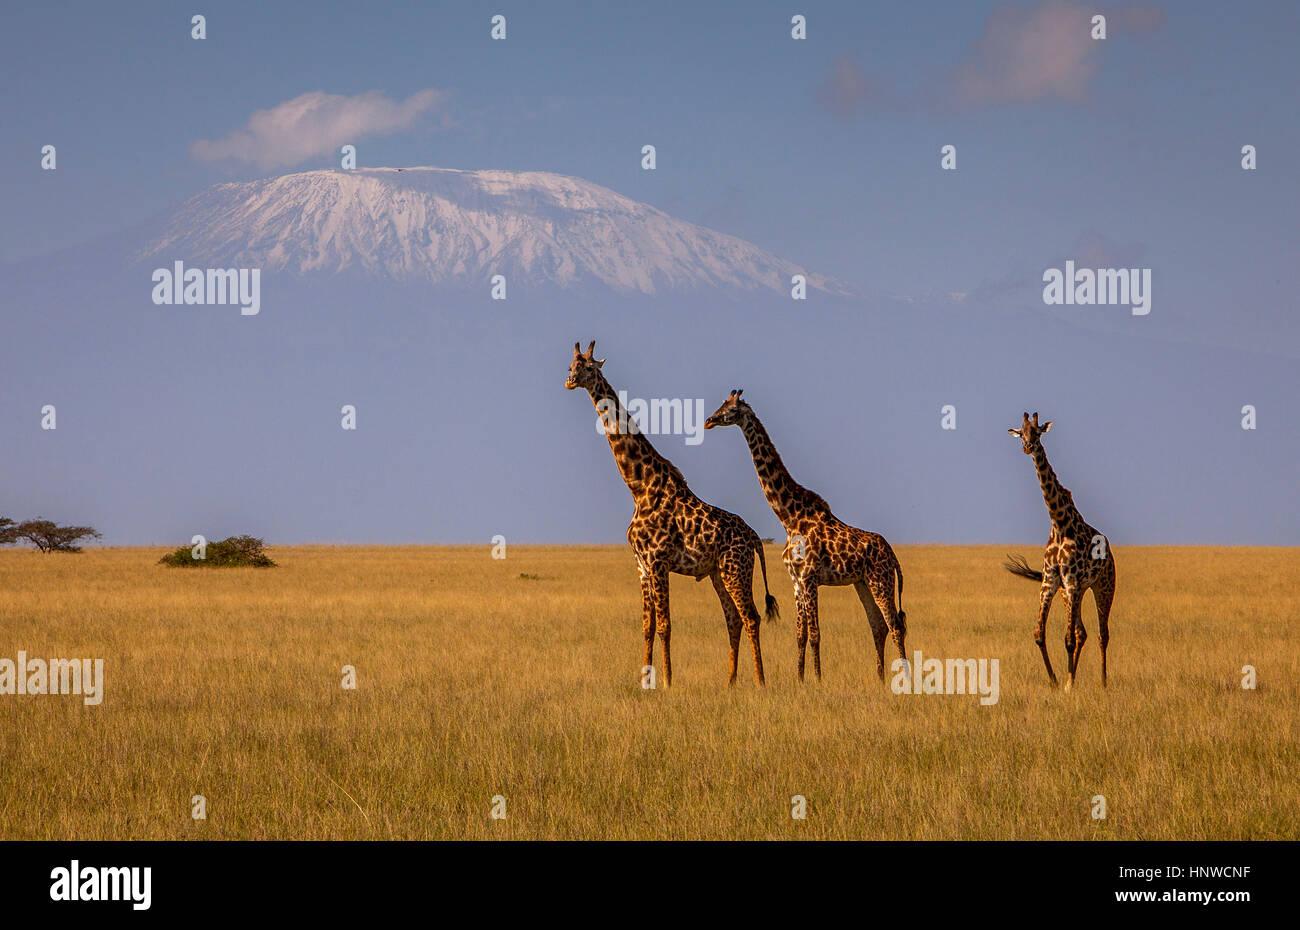 Giraffe, Giraffa camelopardalis, with Mount Kilimanjaro in the background, Chyulu Hills National Park, Kenya - Stock Image